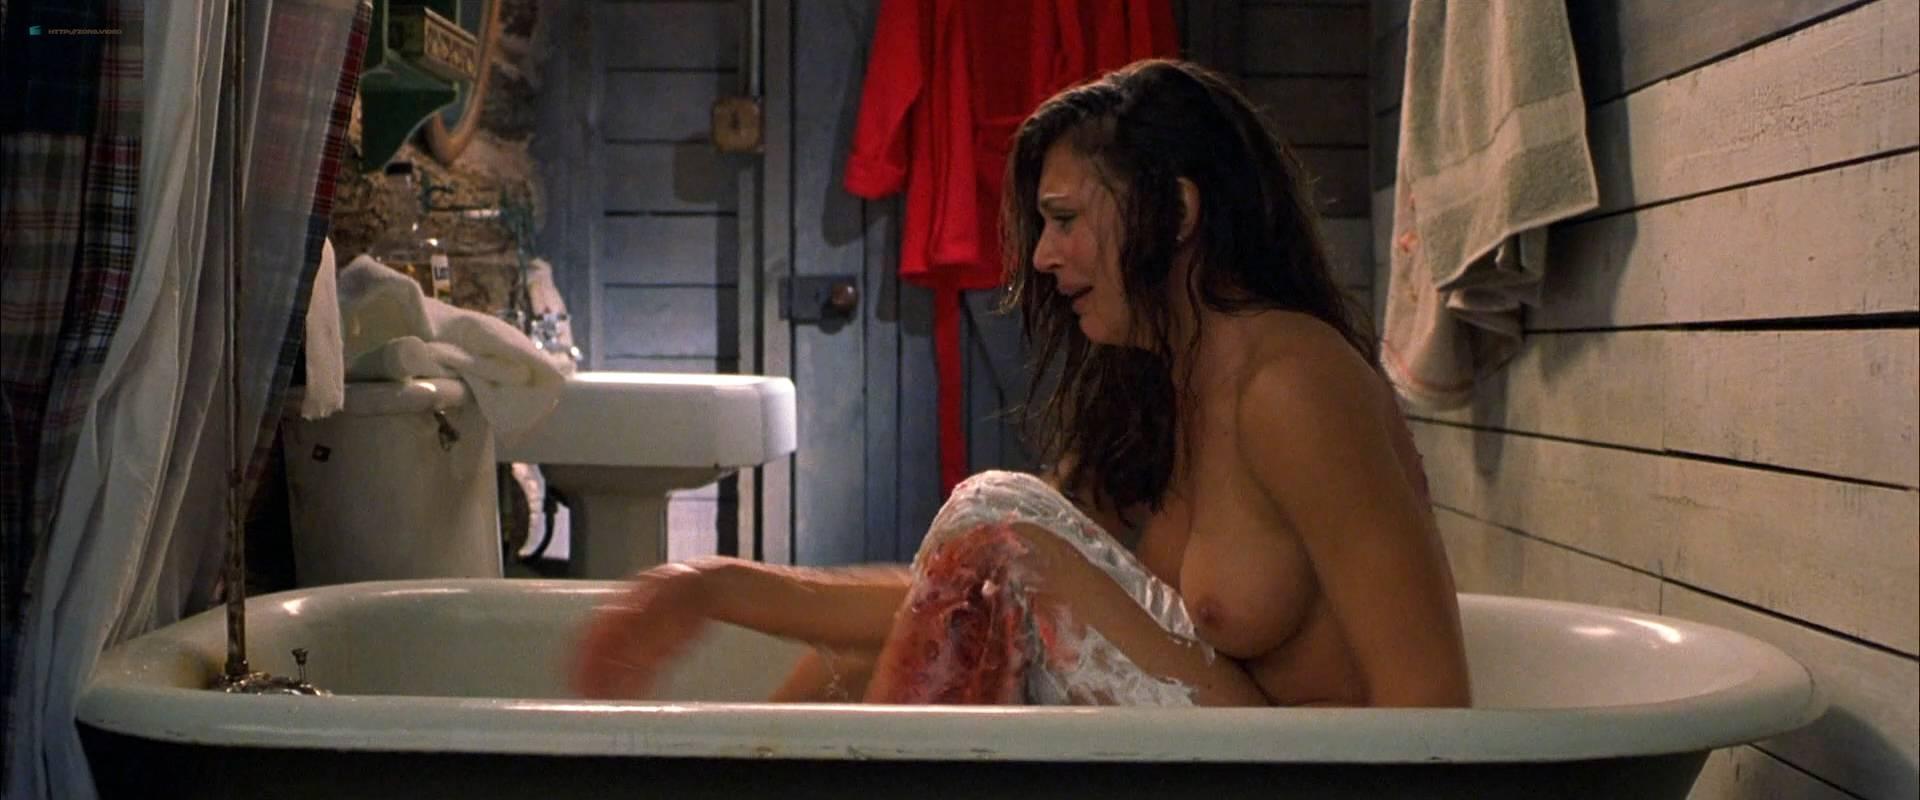 Cerina vincent sex scenes